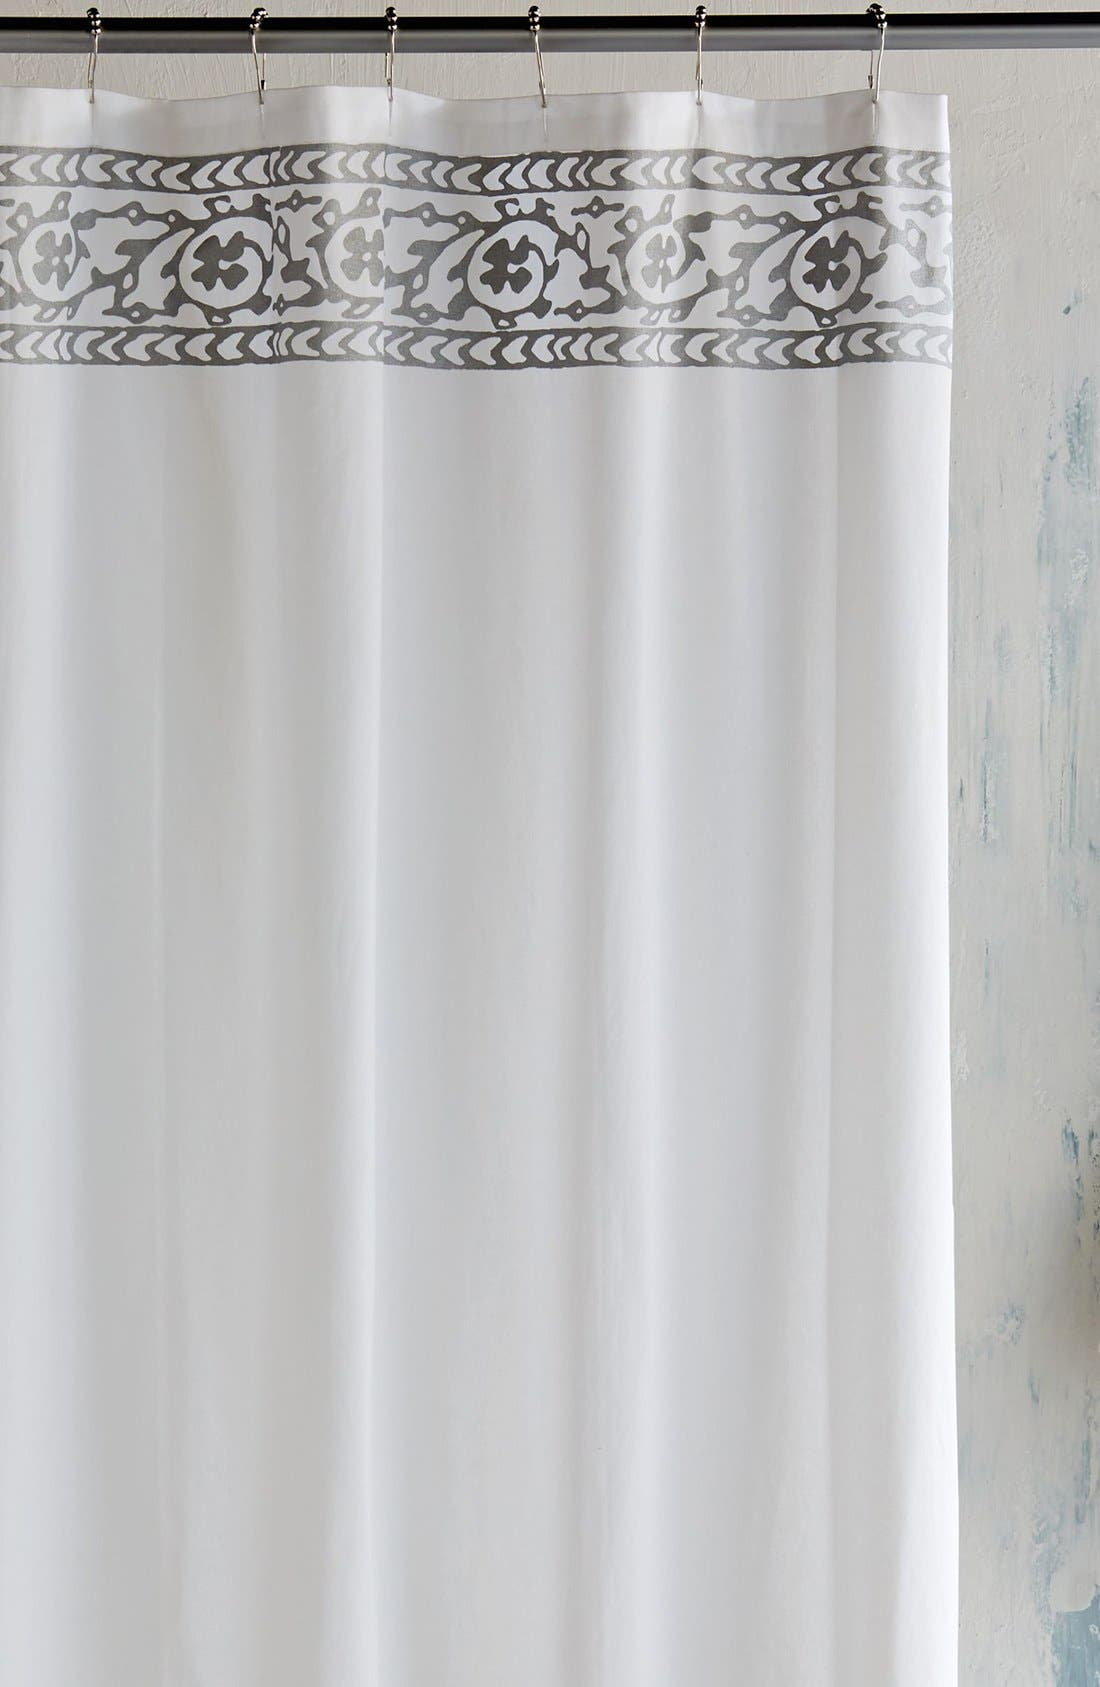 JOHN ROBSHAW Shower Curtains Bath | Nordstrom